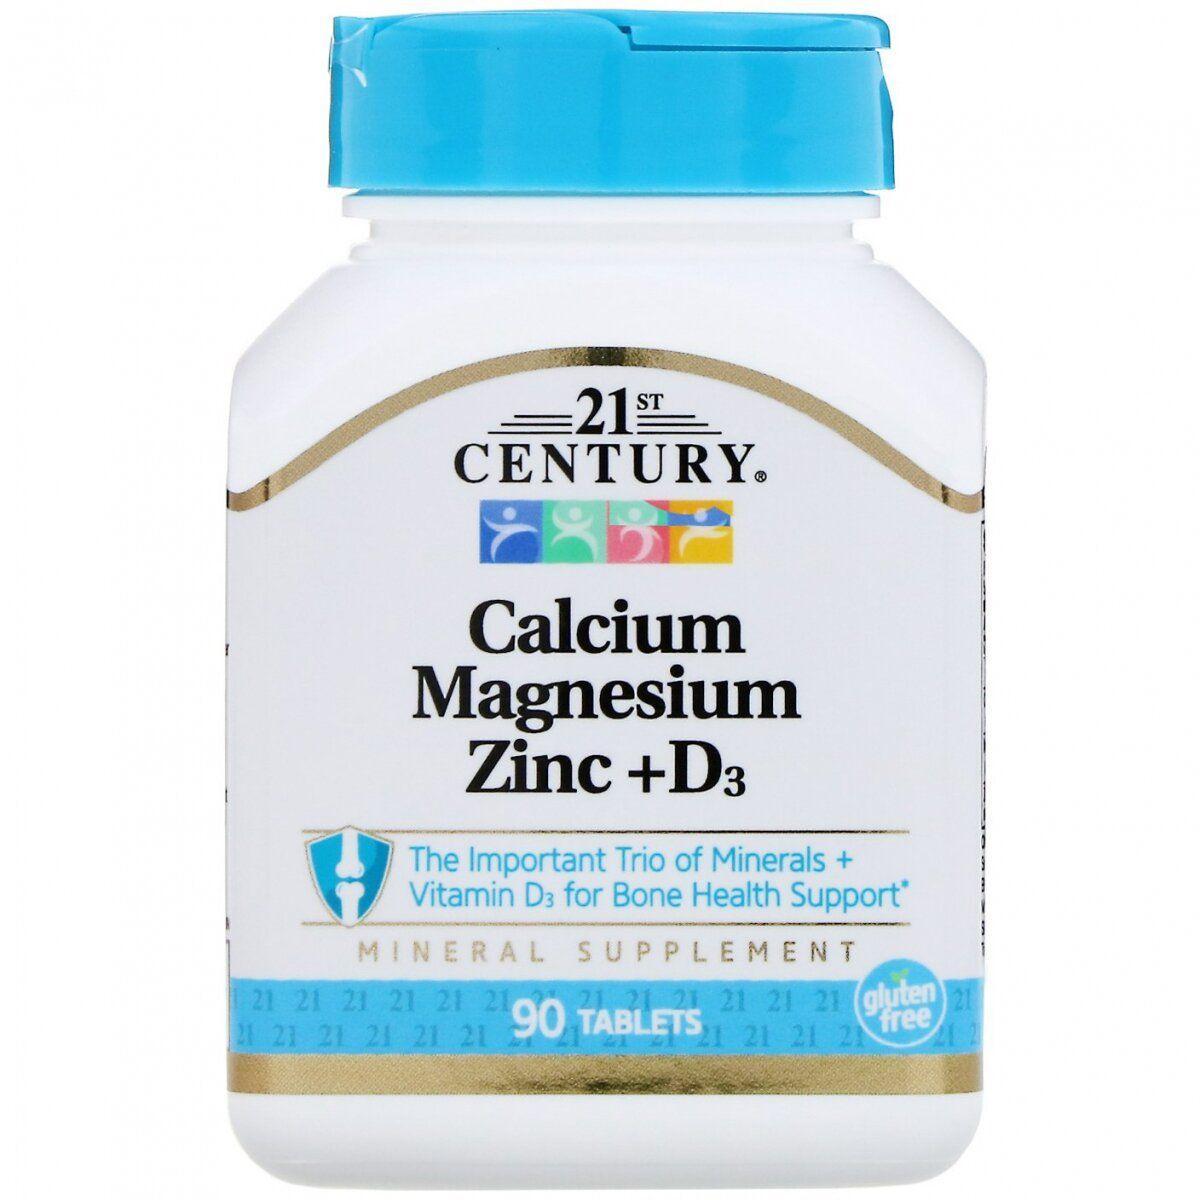 21st Century Calcium Magnesium Zinc + D3, Кальцій, магній, цинк + Д3 (90 таб.)